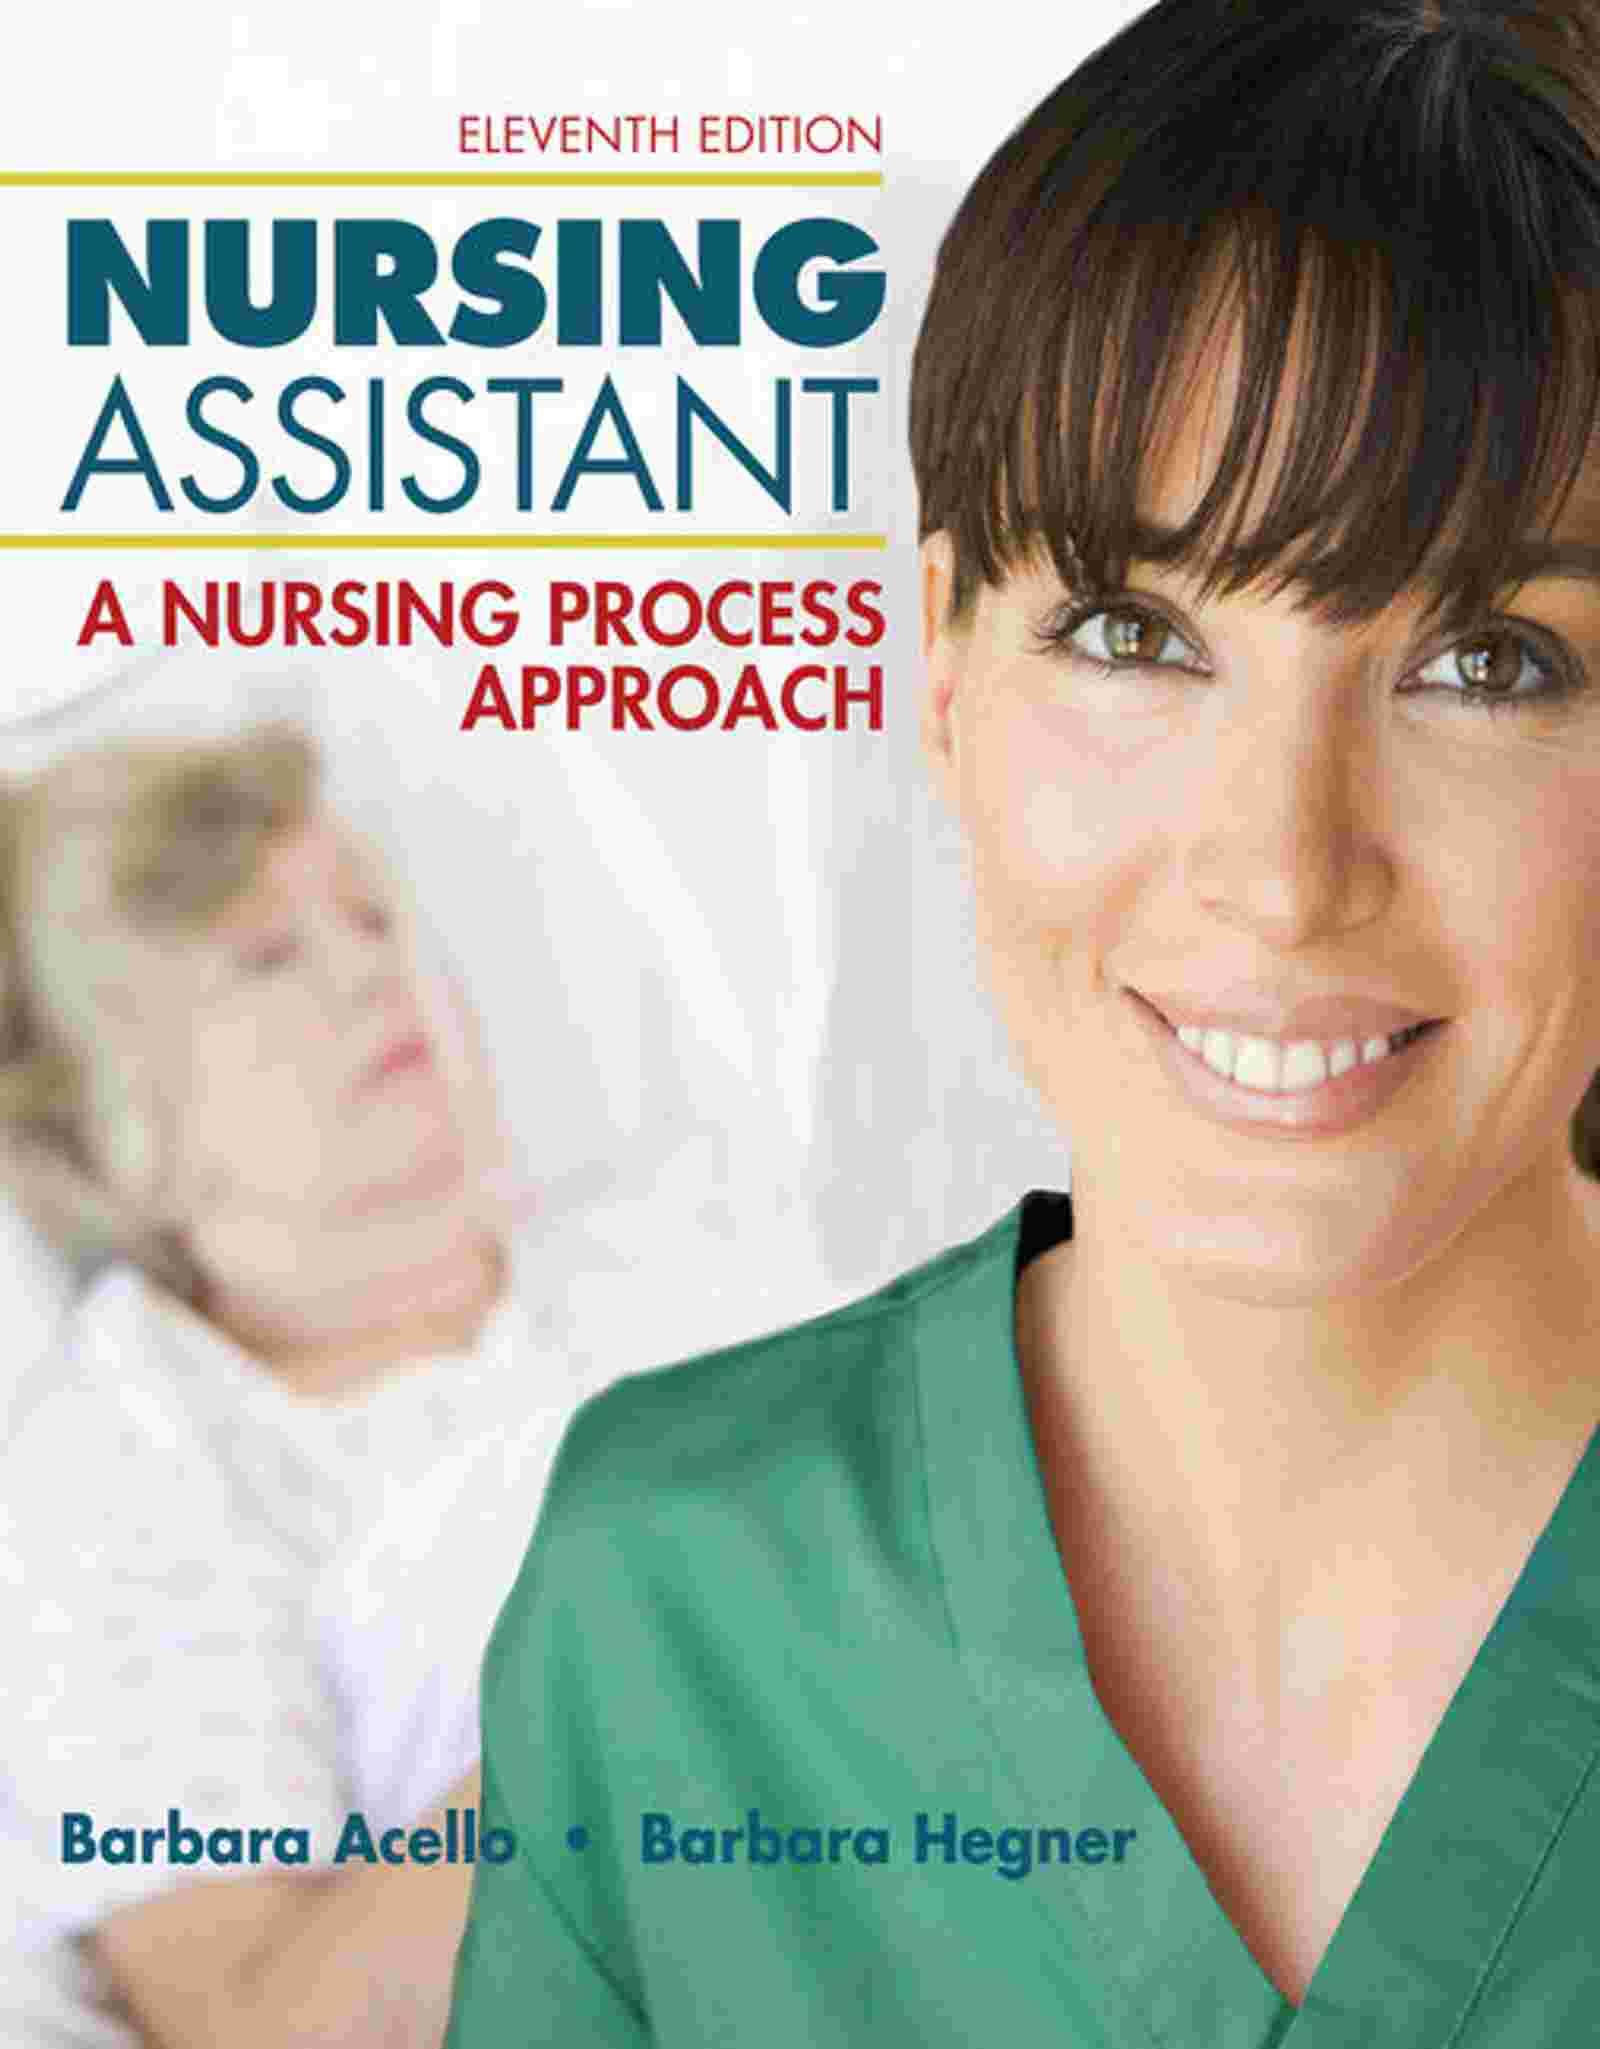 Nursing Assistant: A Nursing Process Approach, 11th Edition